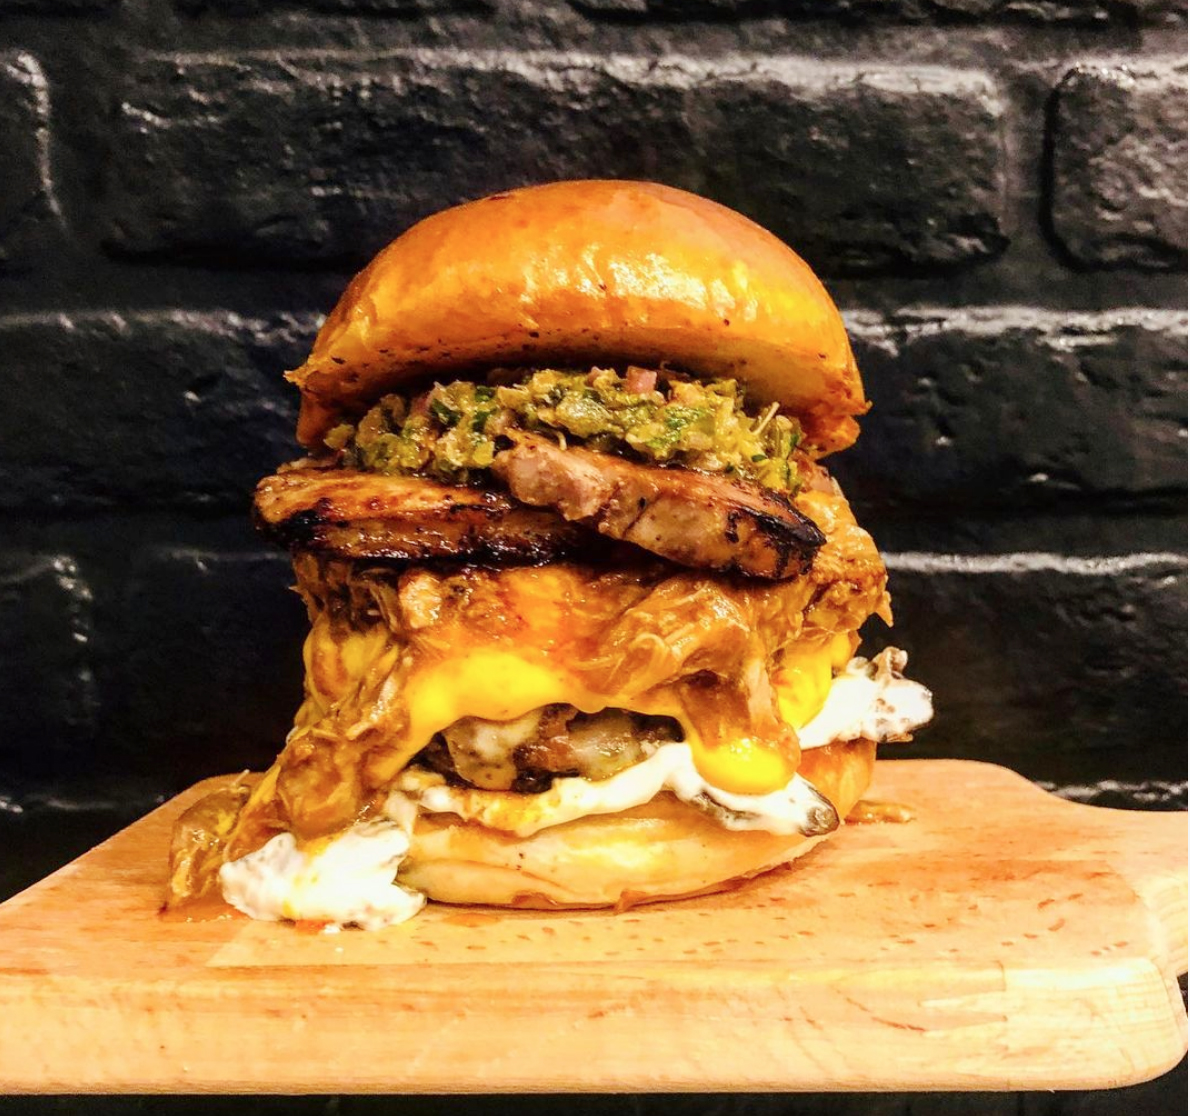 Baka Vieja Bilbao con las mejores hamburguesas